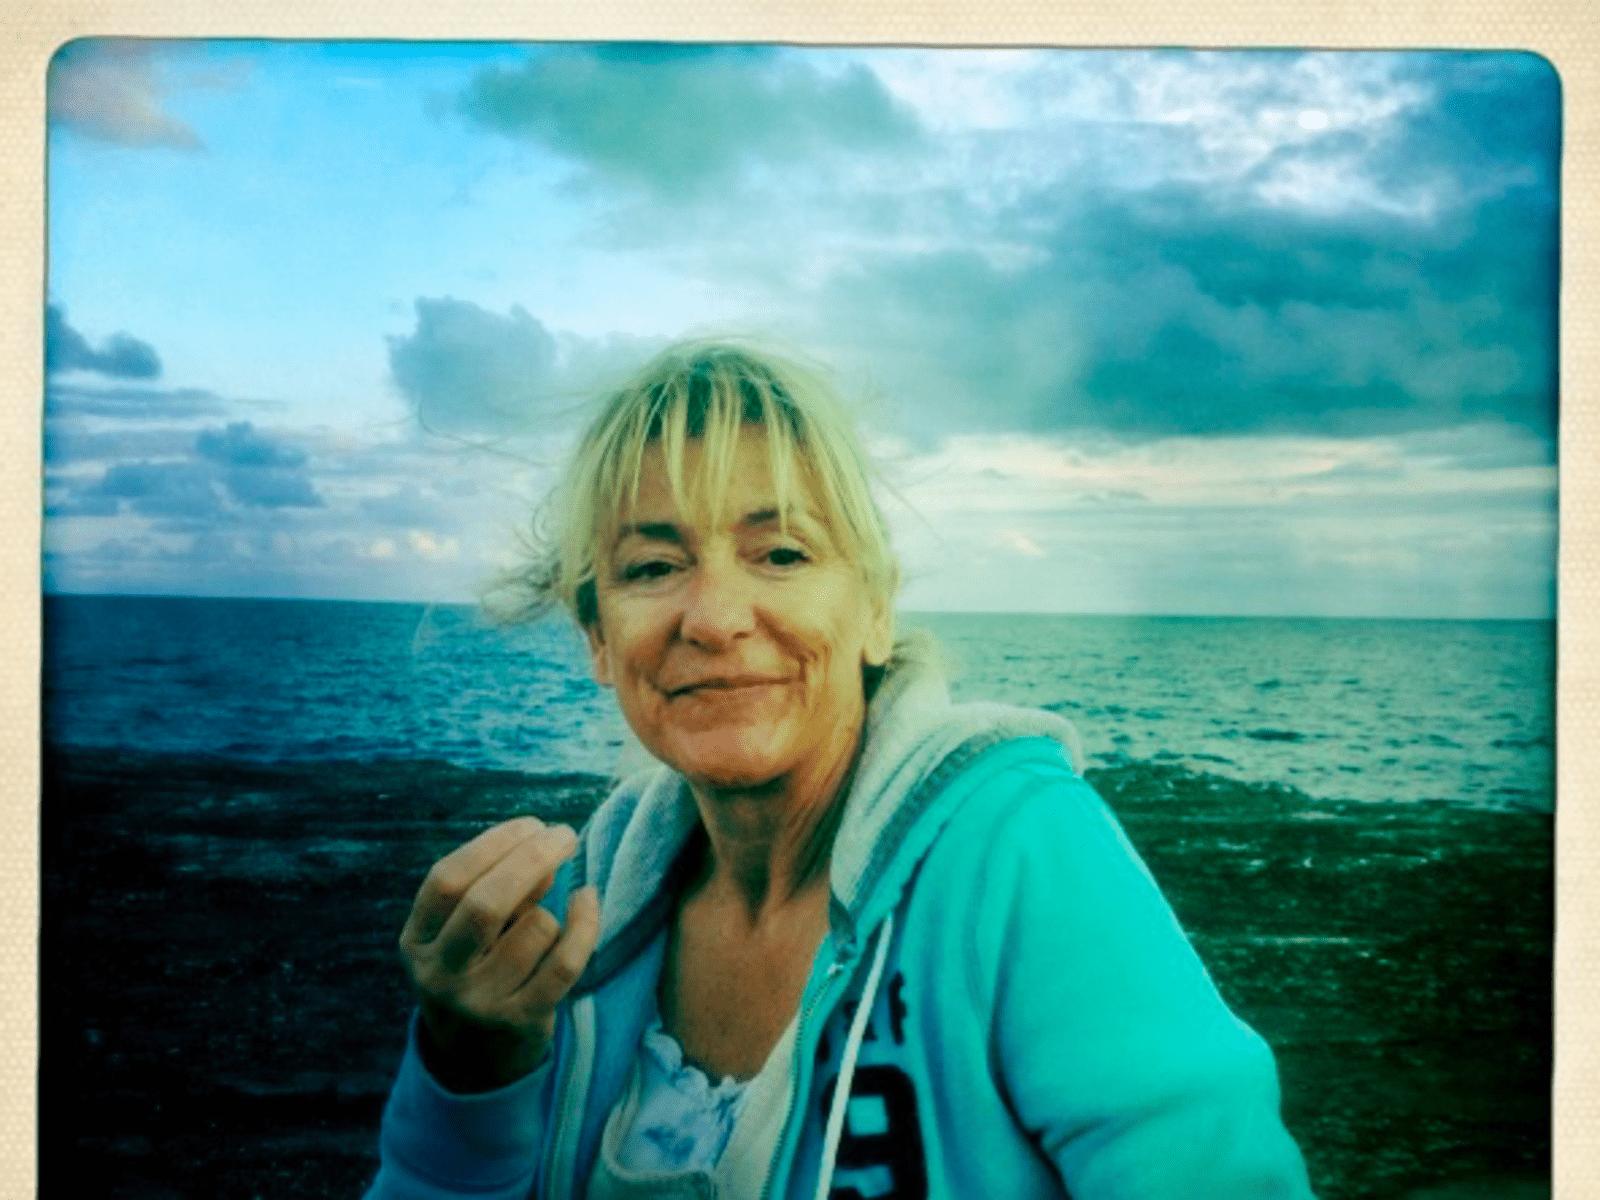 Lizzie from London, United Kingdom